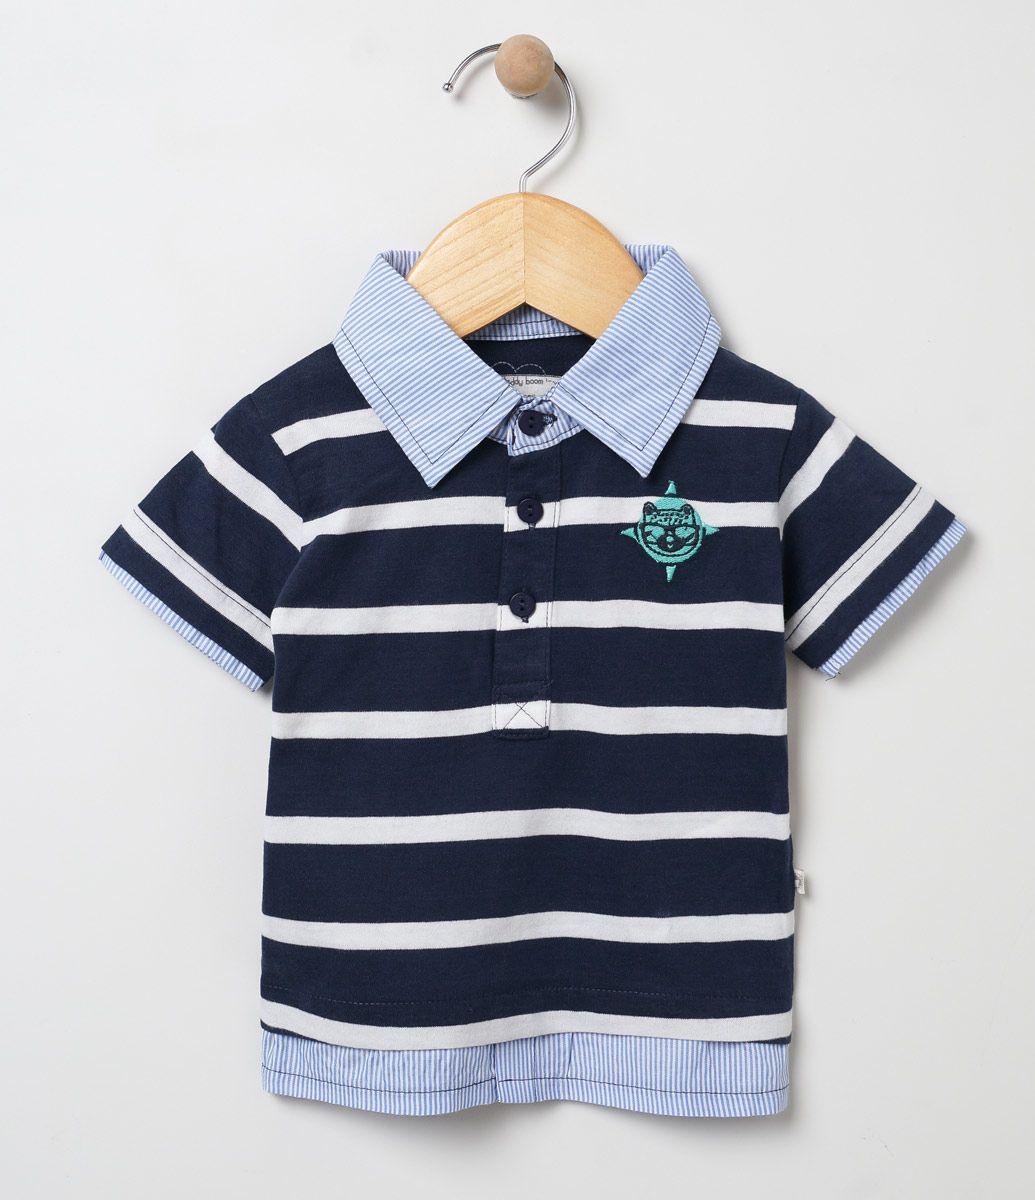 984ba333f Camisa Polo Azul Marisol - Marisol | Baby em 2019 | Polo, Kids outfits e  Polo Shirt